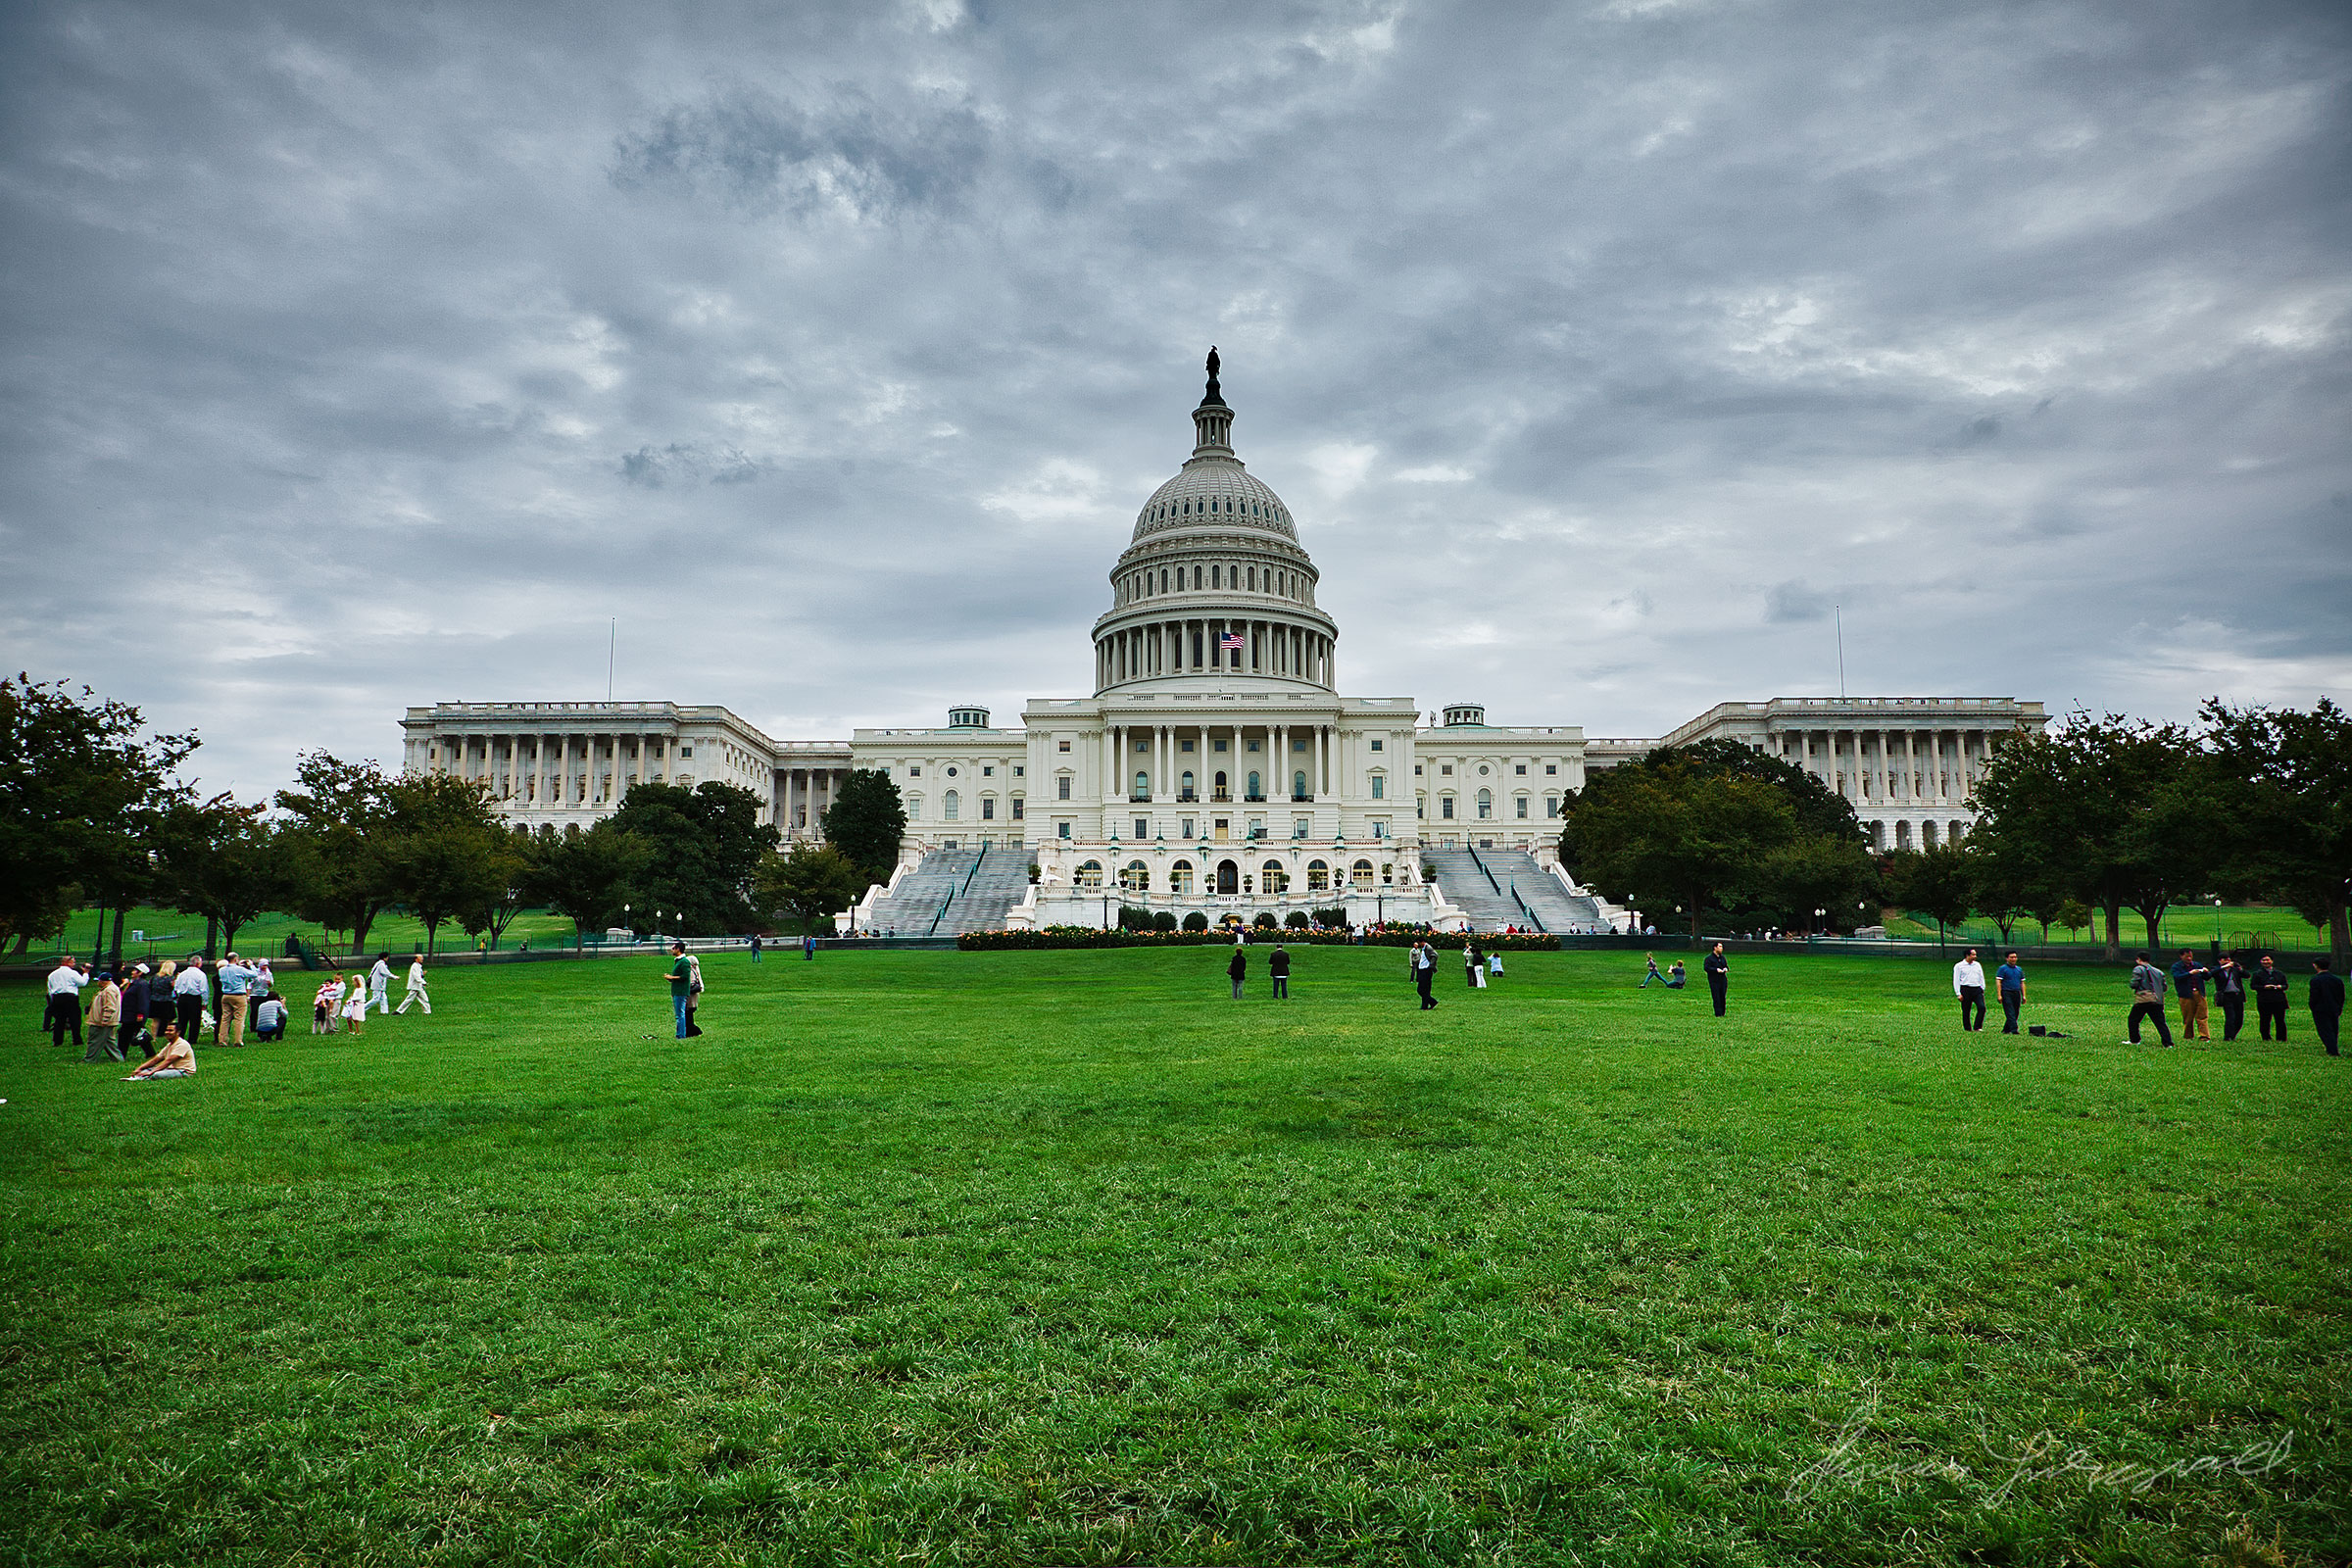 Capitol Building, Washington DC, Canon 5DMarkII